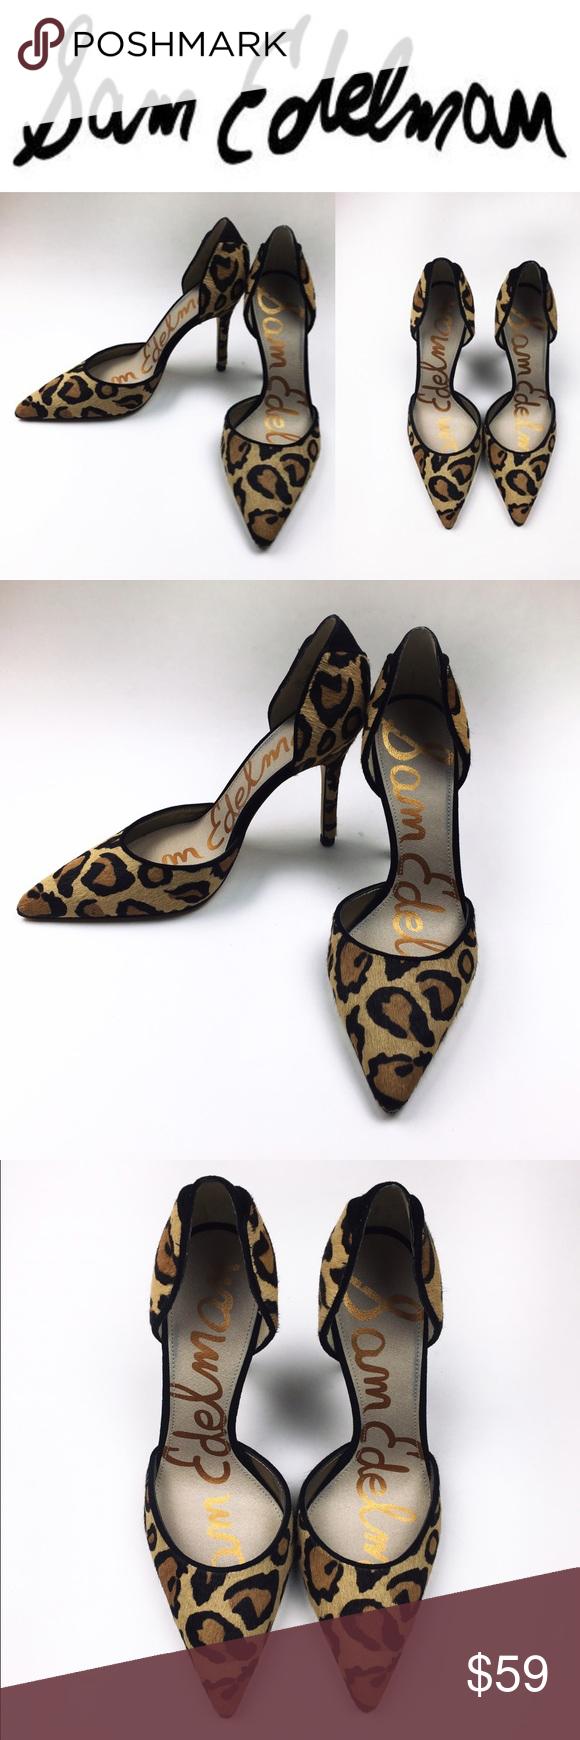 14189cb1272a73 🐯Sam Edelman Delilah calf hair leopard pumps Exotic Sam Edelman Leopard  pumps with real fur